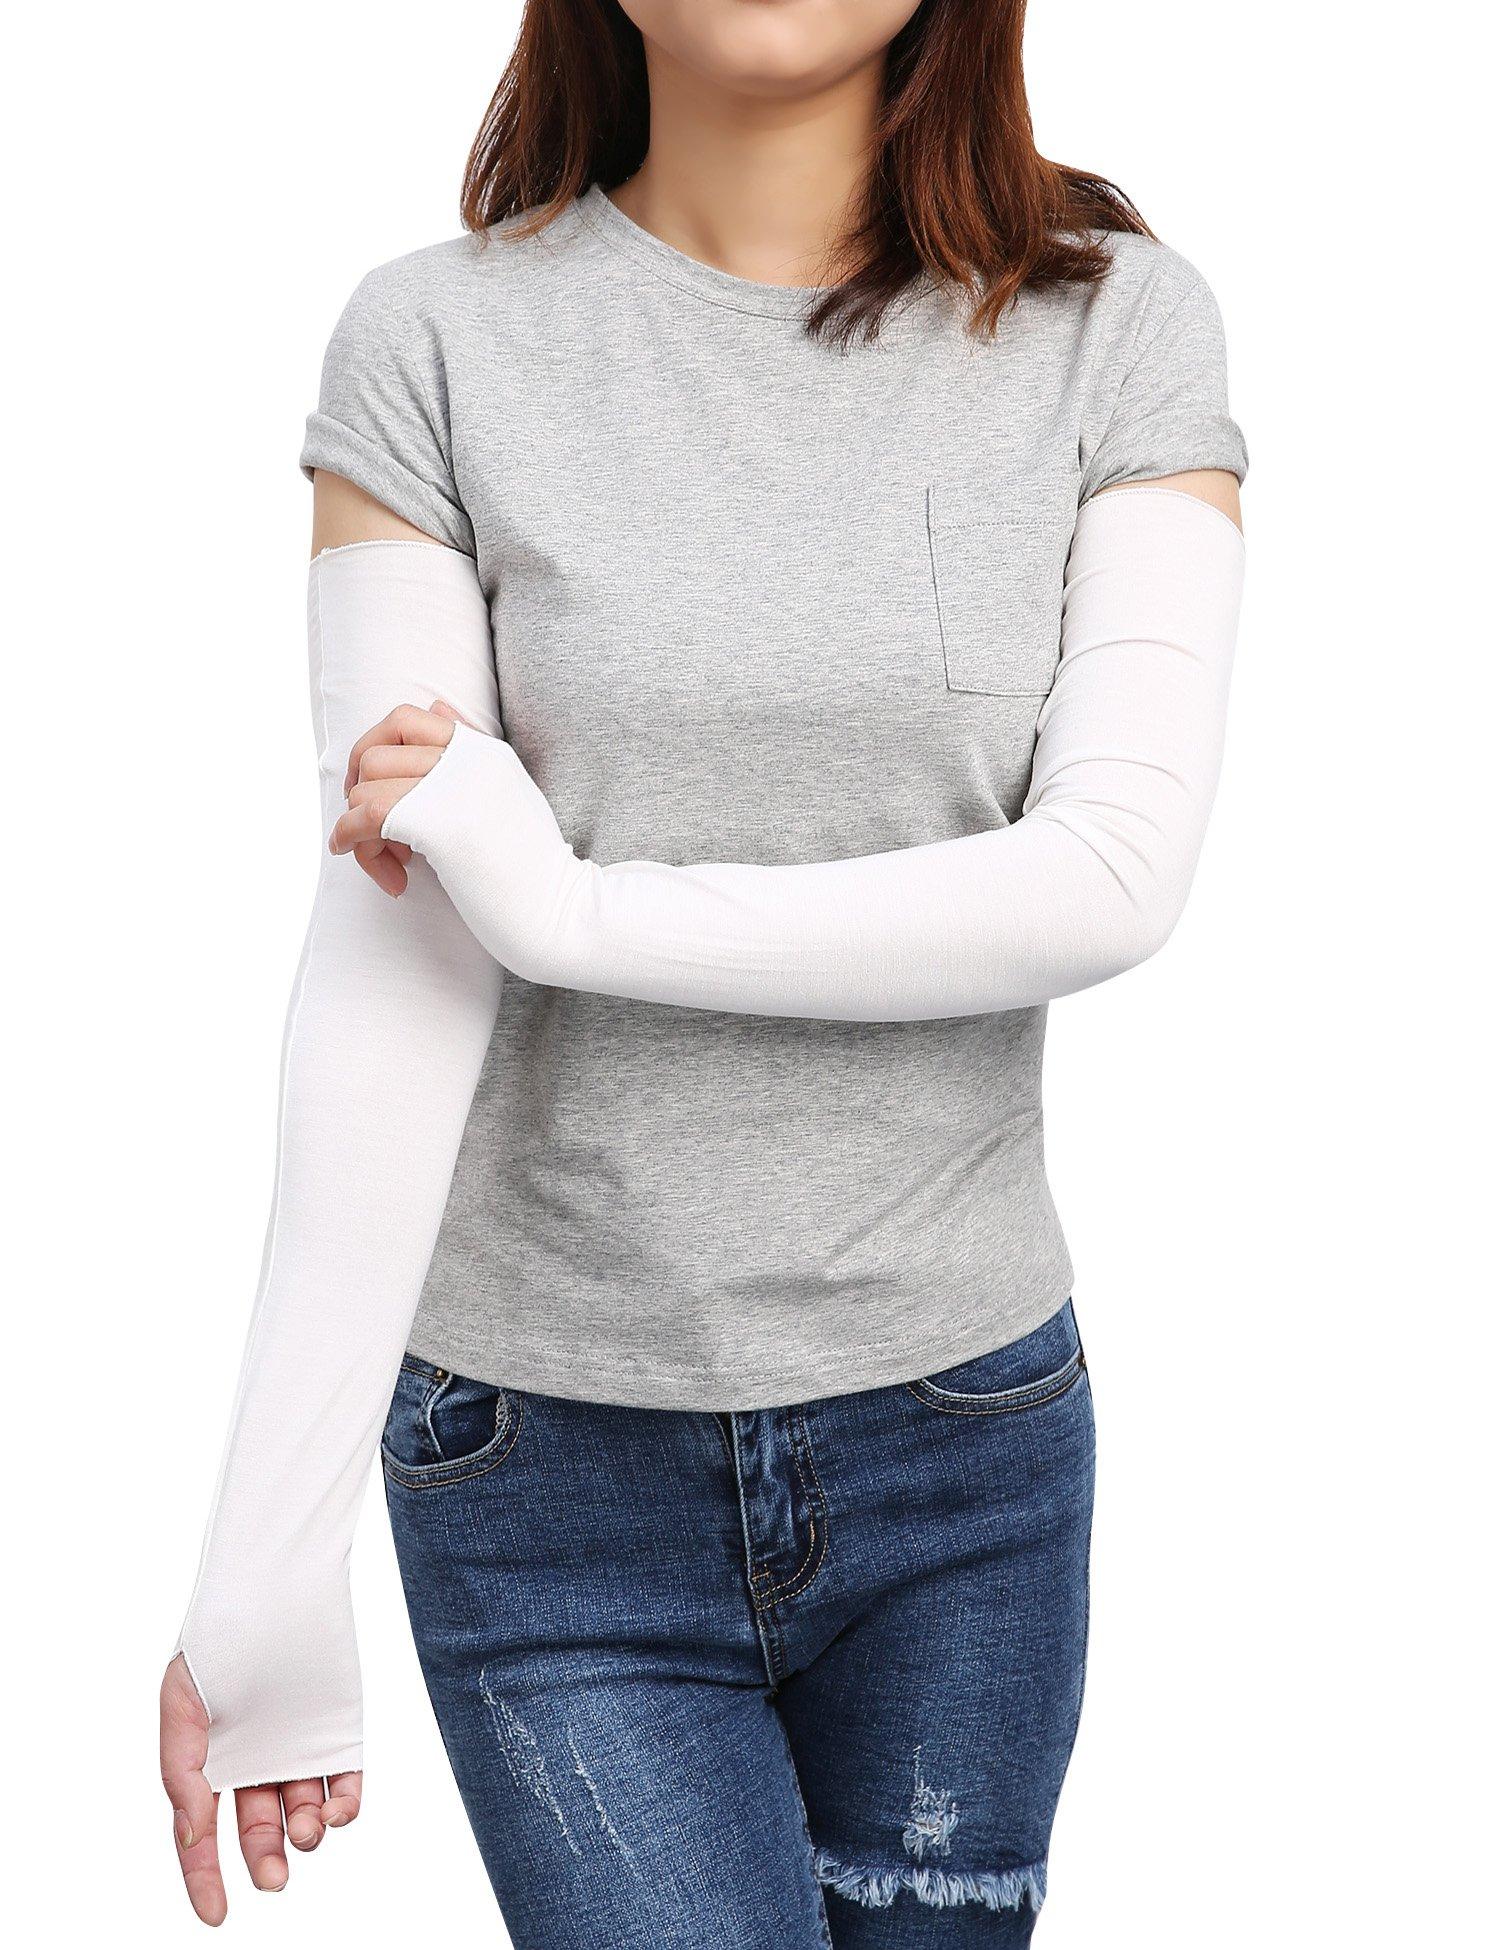 Sheeper Women's Arm Warmer Sleeve Sun Block Stretchy Long Fingerless Driving Gloves (White)